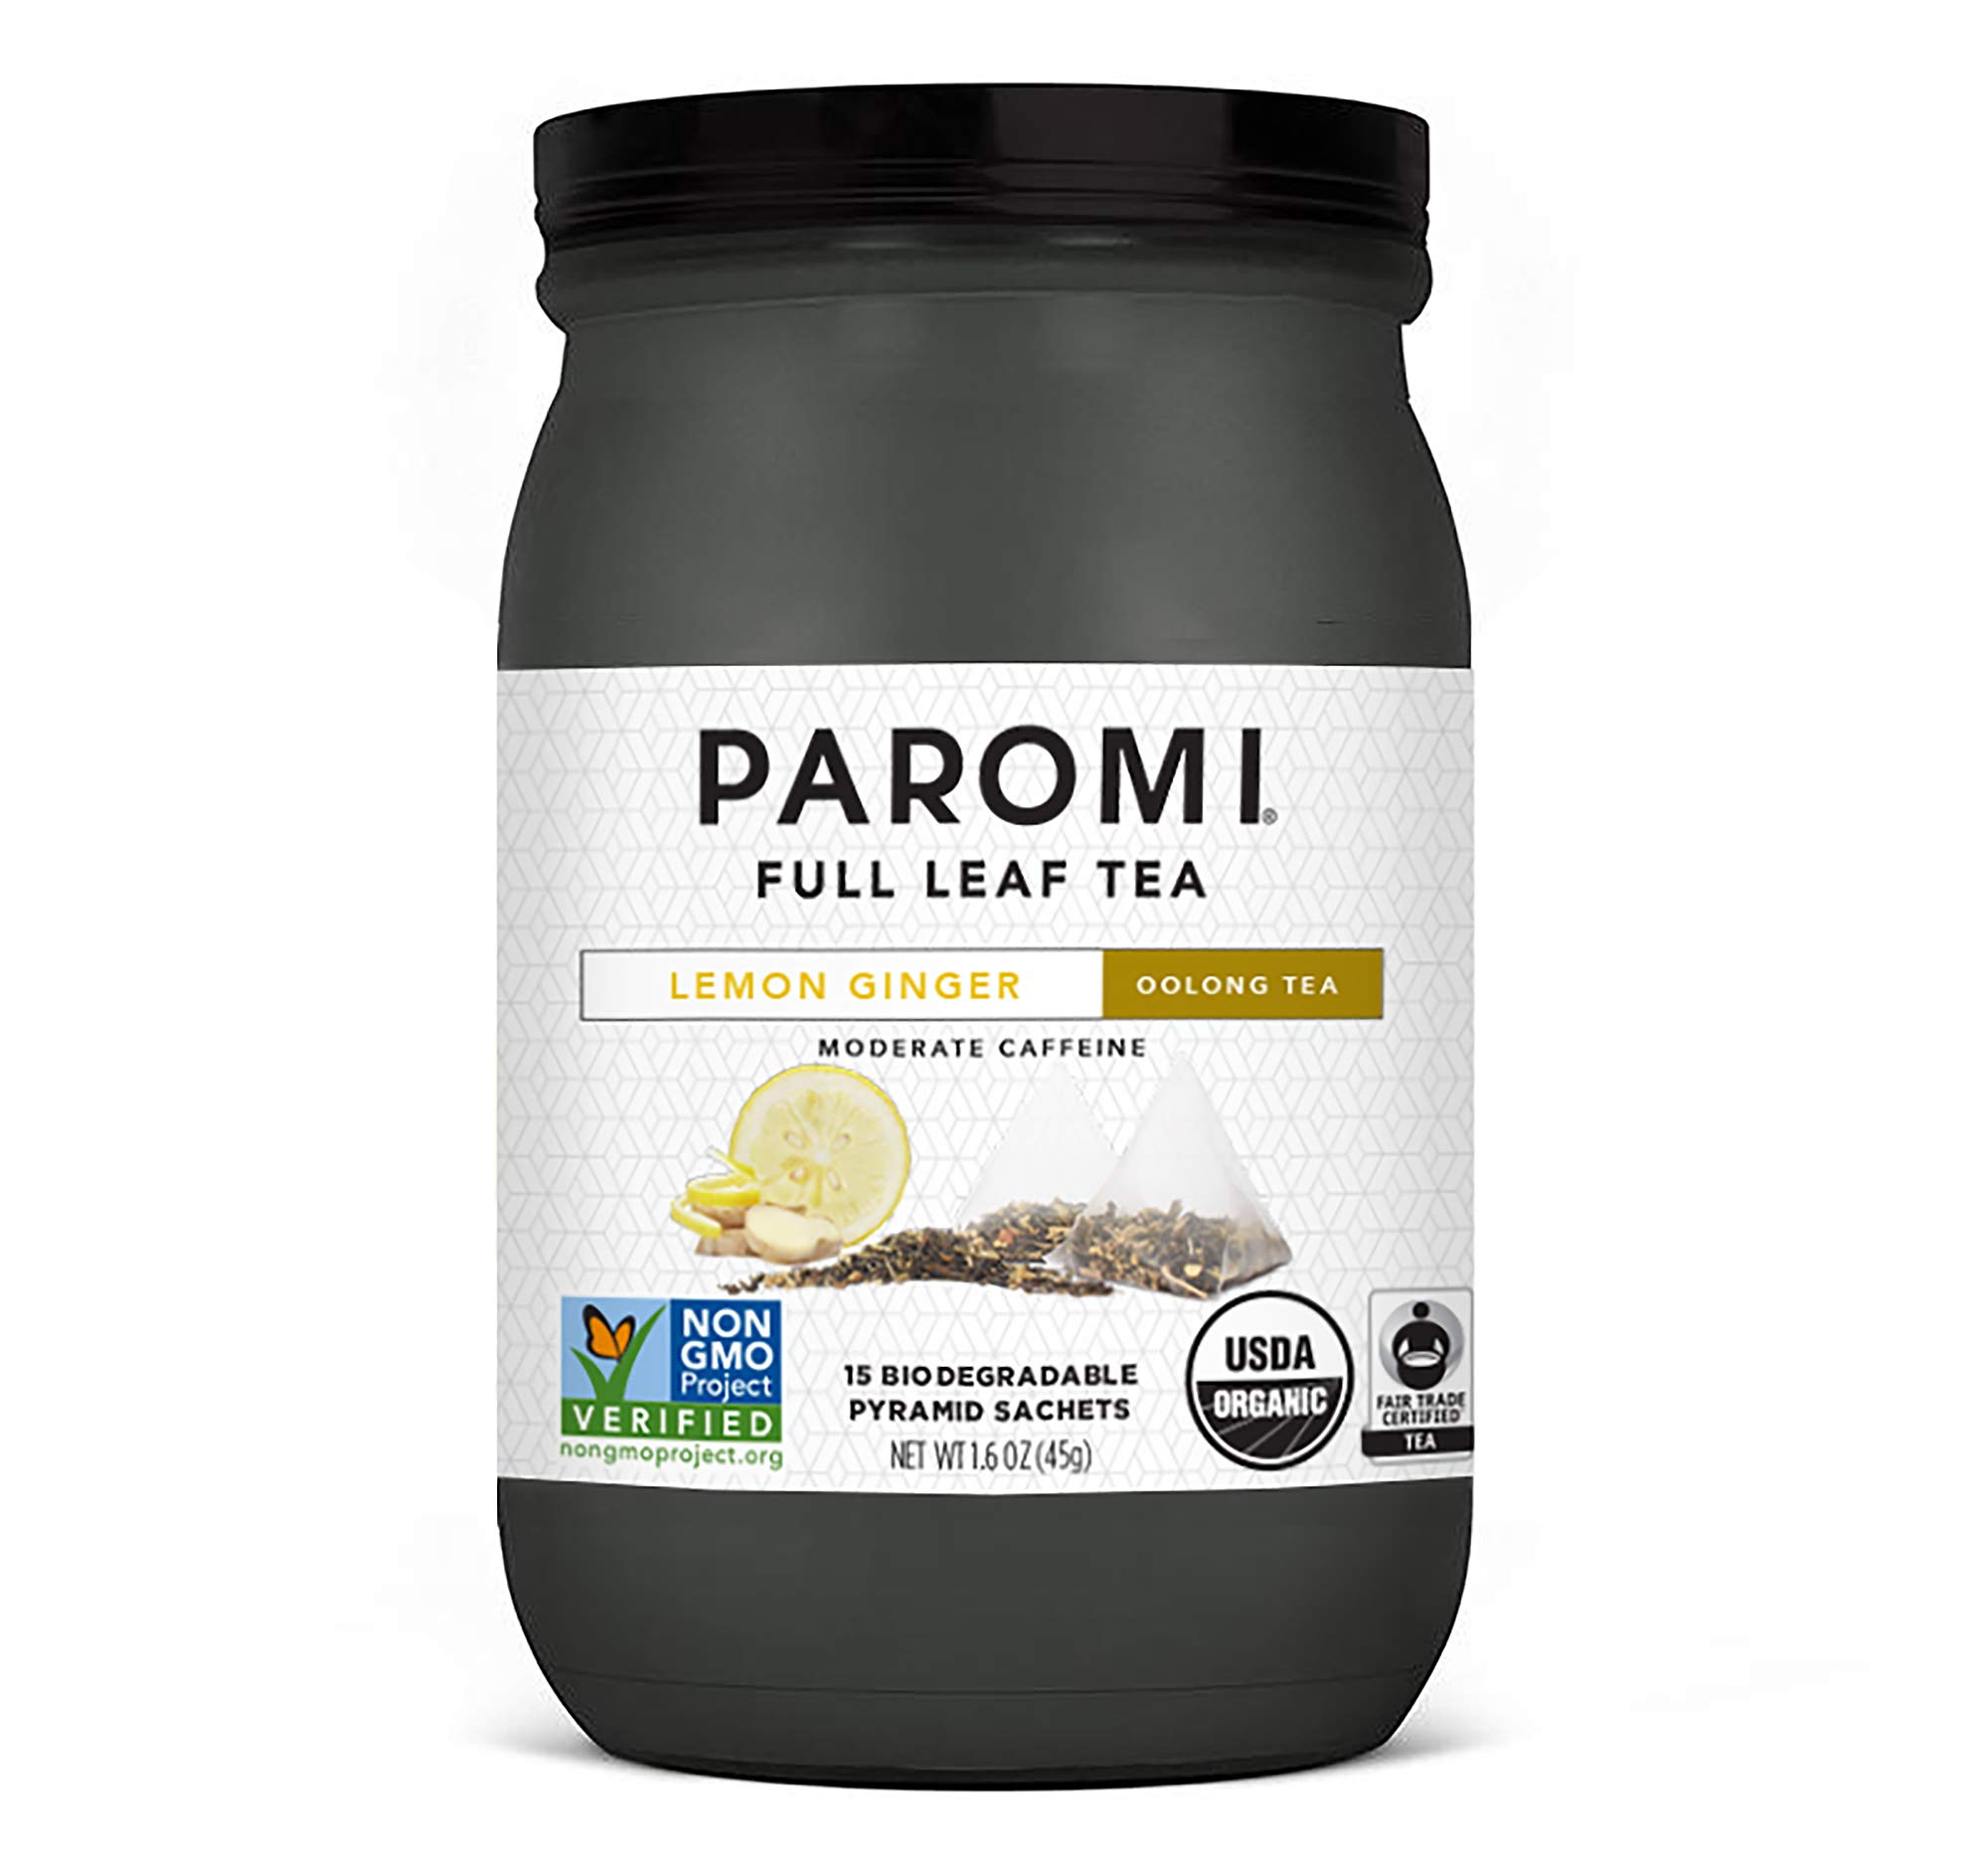 Paromi Tea Organic Lemon Ginger Oolong Tea, 15 Pyramid Tea Bags - Non-GMO by Paromi